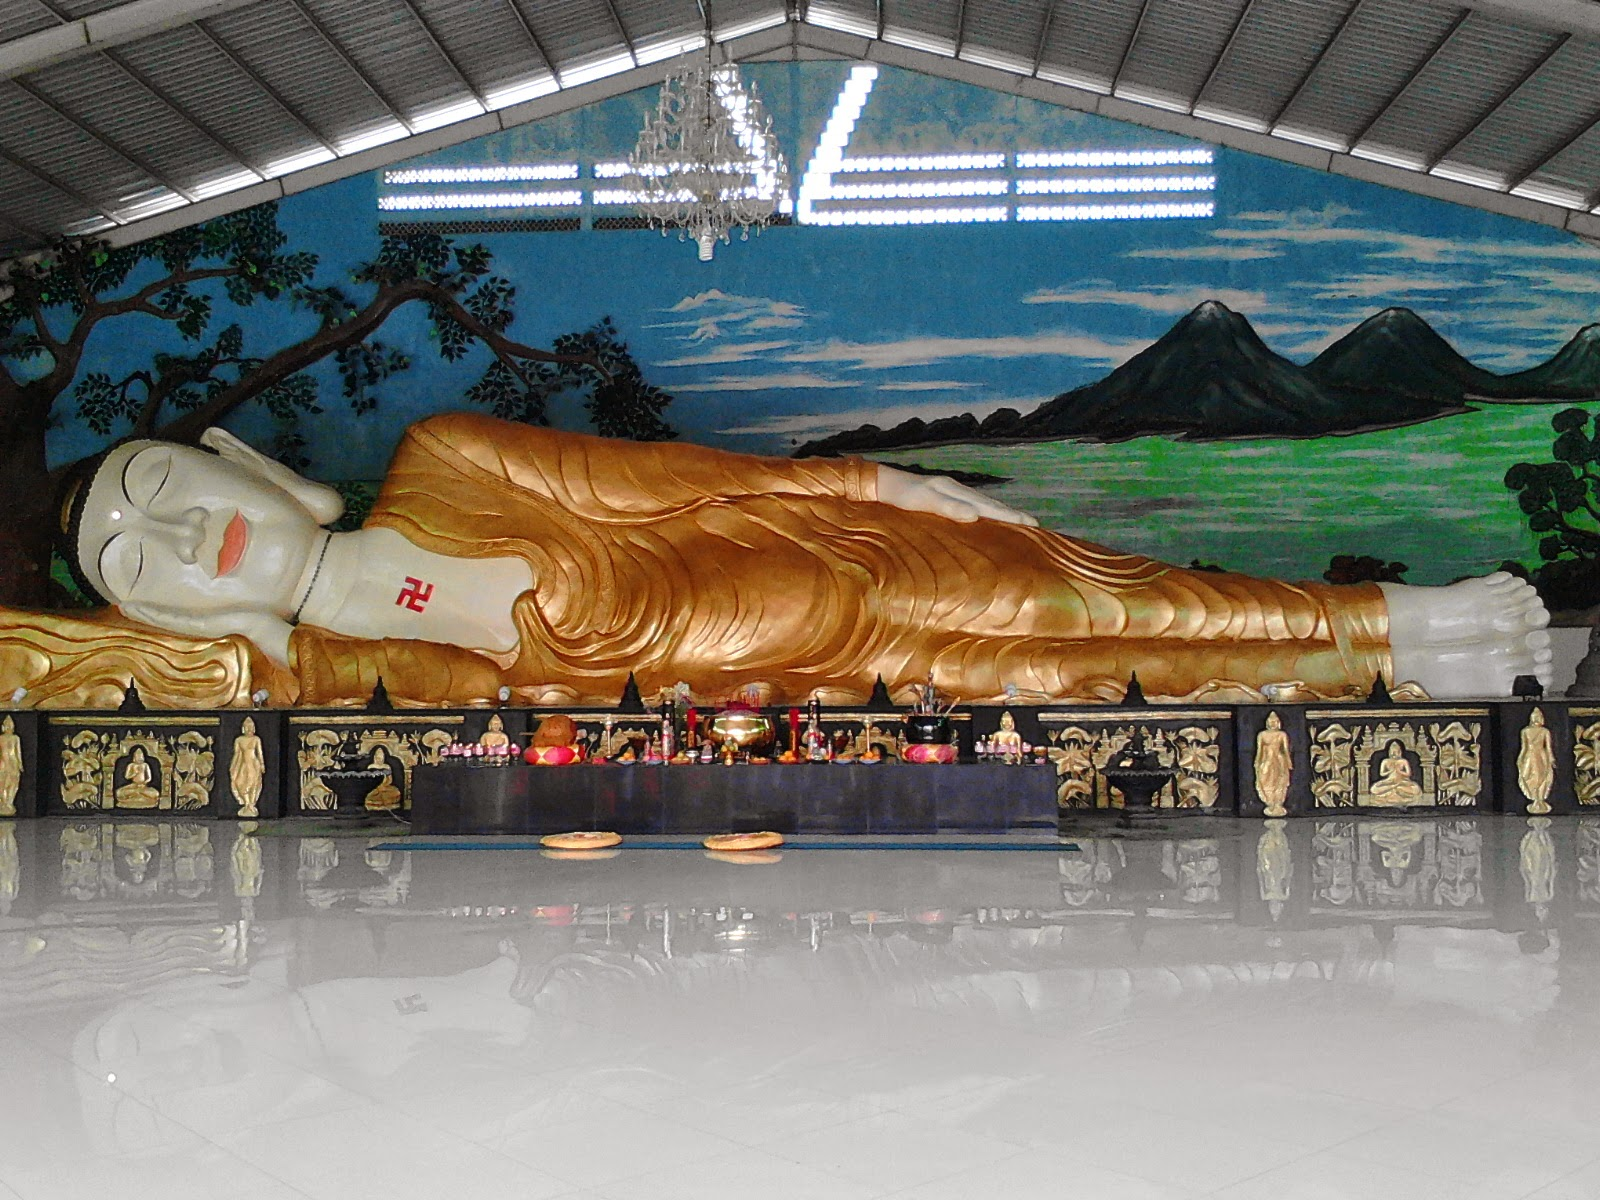 Patung Buddha Tidur Raksasa Bogor Sleeping Kita Menggunakan Kendaraan Arah